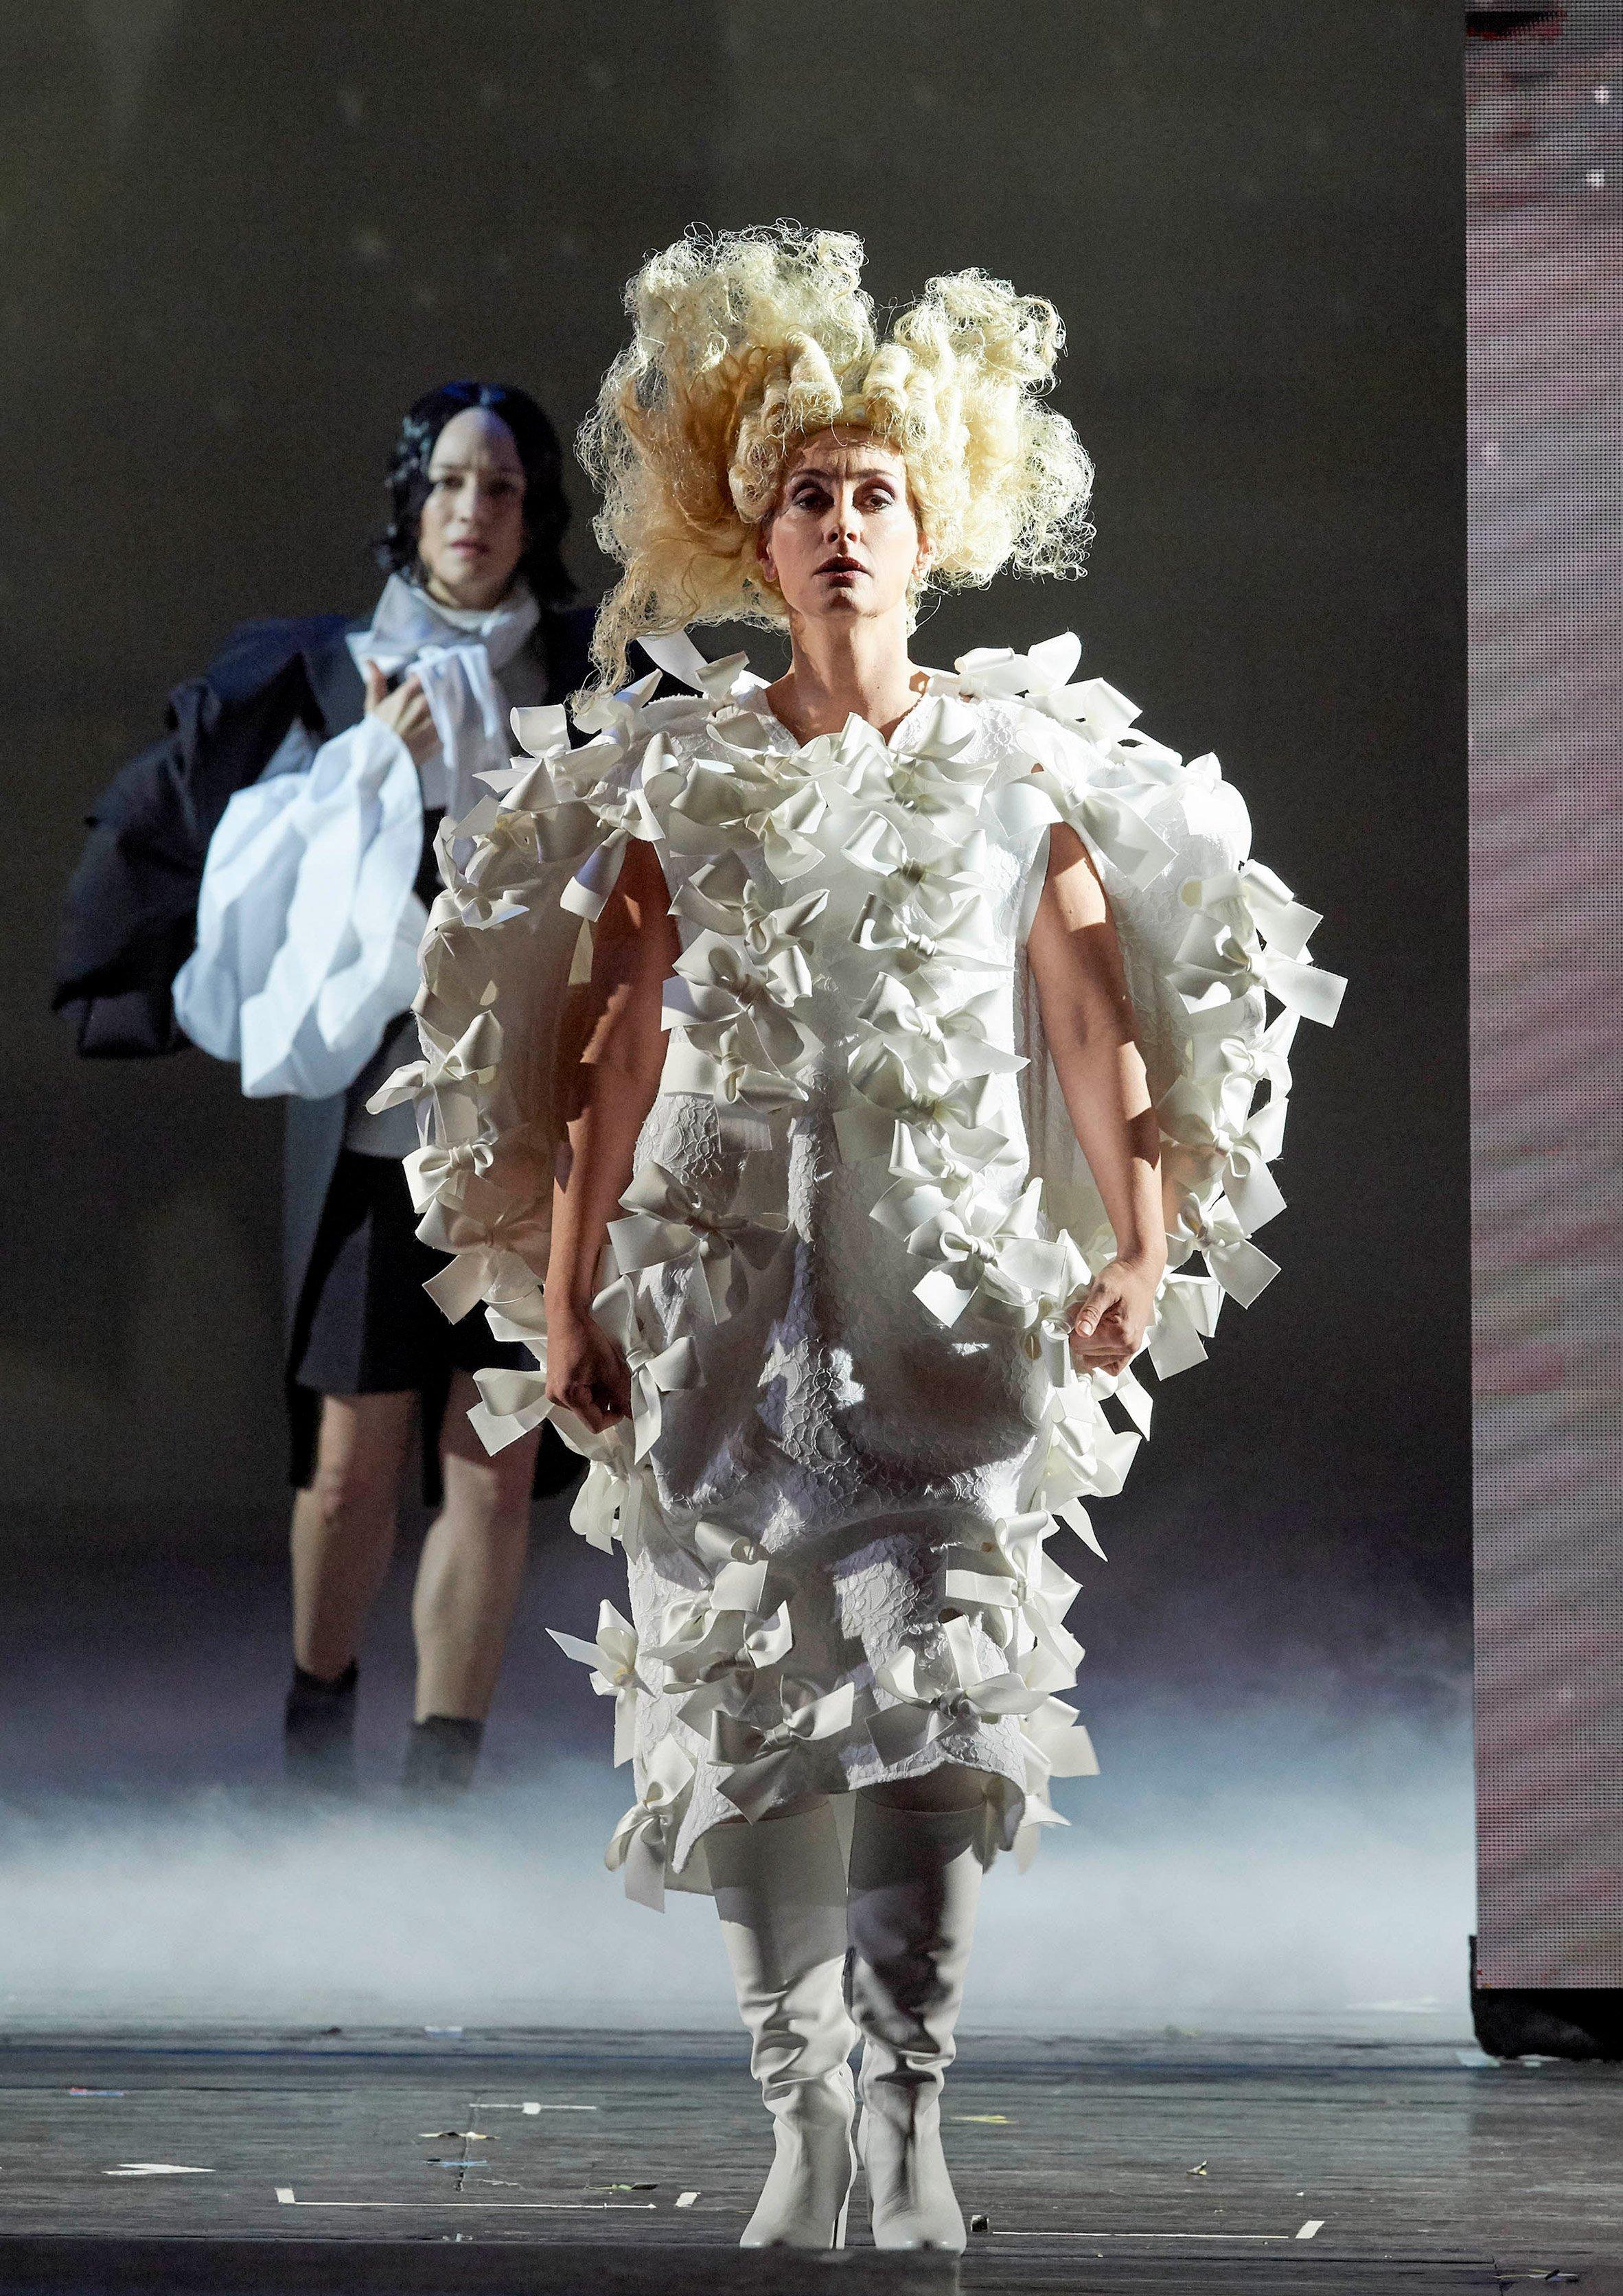 Rei Kawakubo costumes Orlando Vienna State Opera